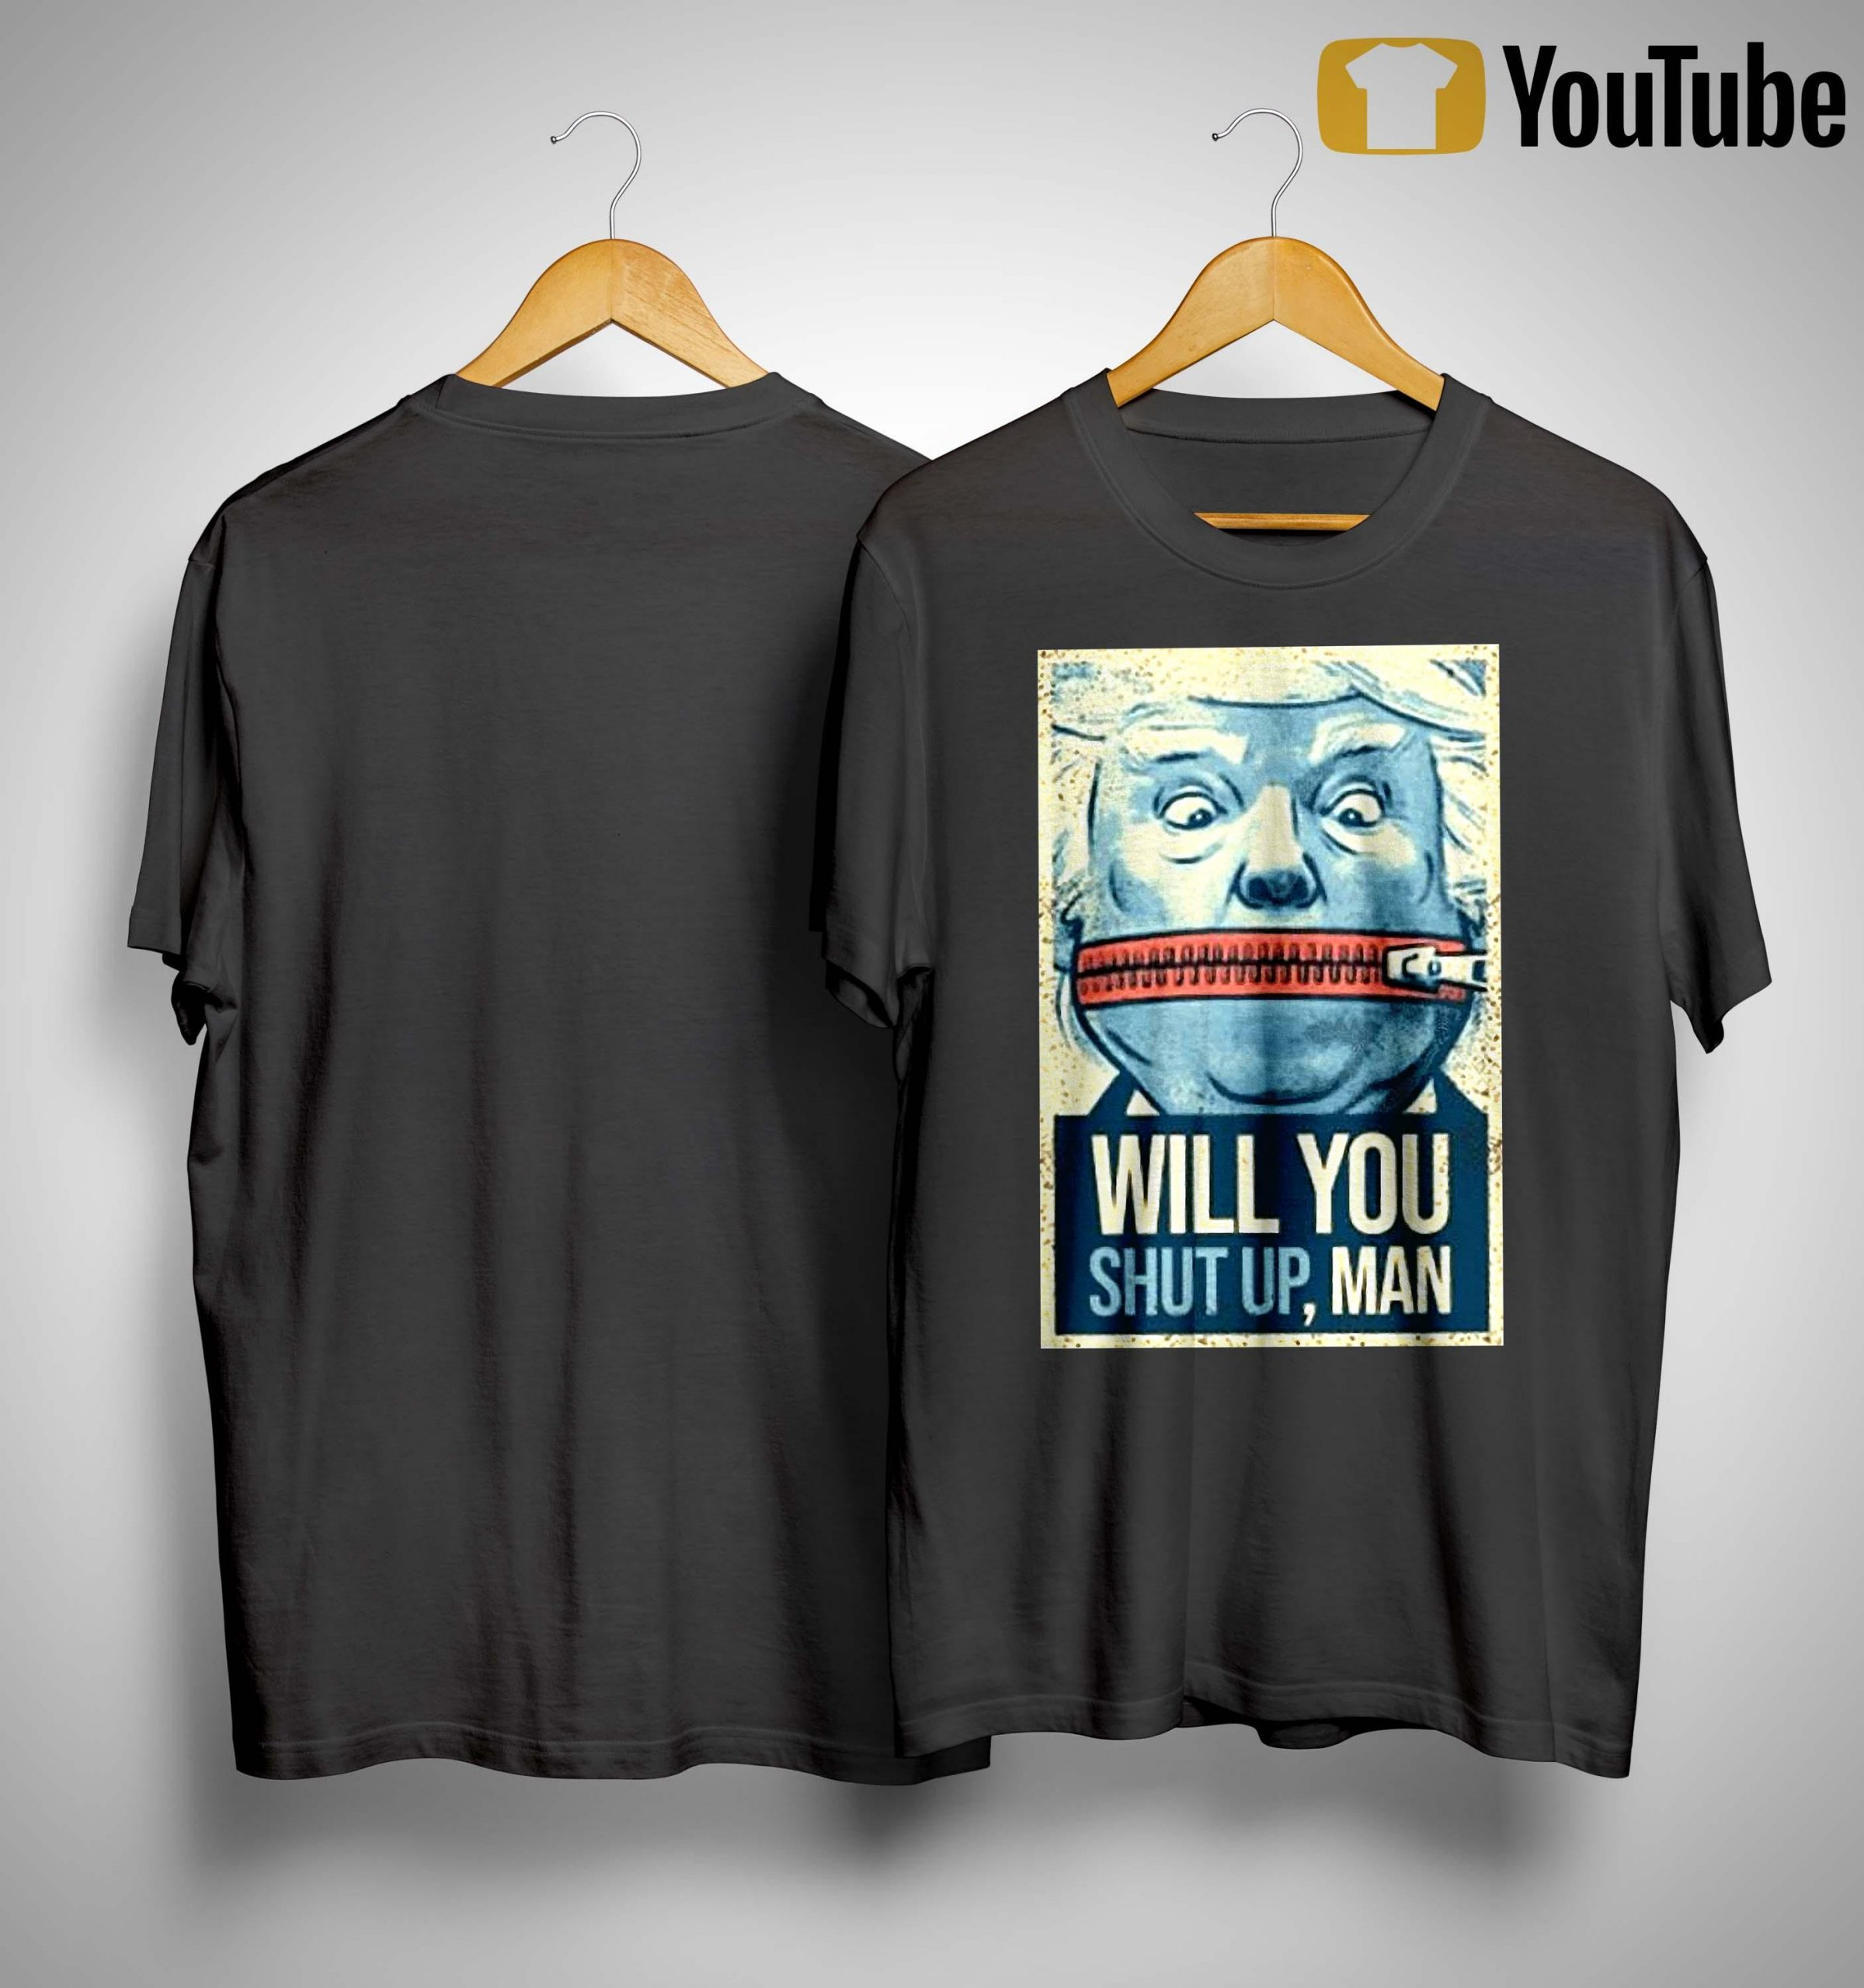 Trump Lock Your Mouth Will You Shut Up Man Shirt